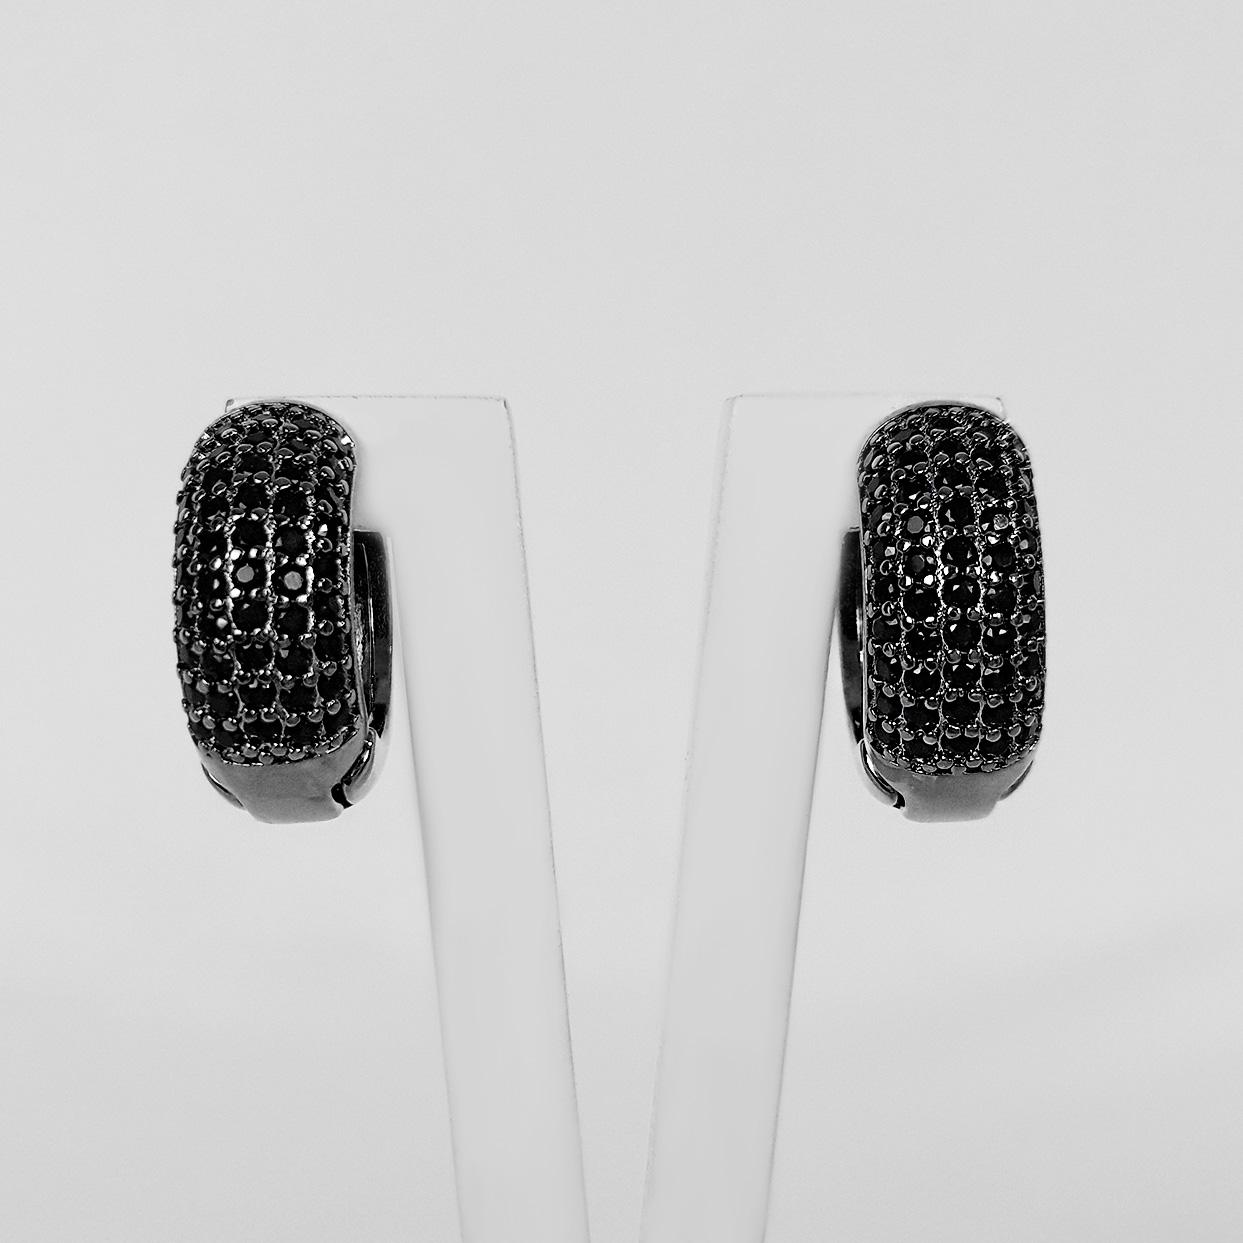 Brinco Argola 1,5cm 5 Filetes de Zircônias Banho Ródio Negro  - Lunozê Joias